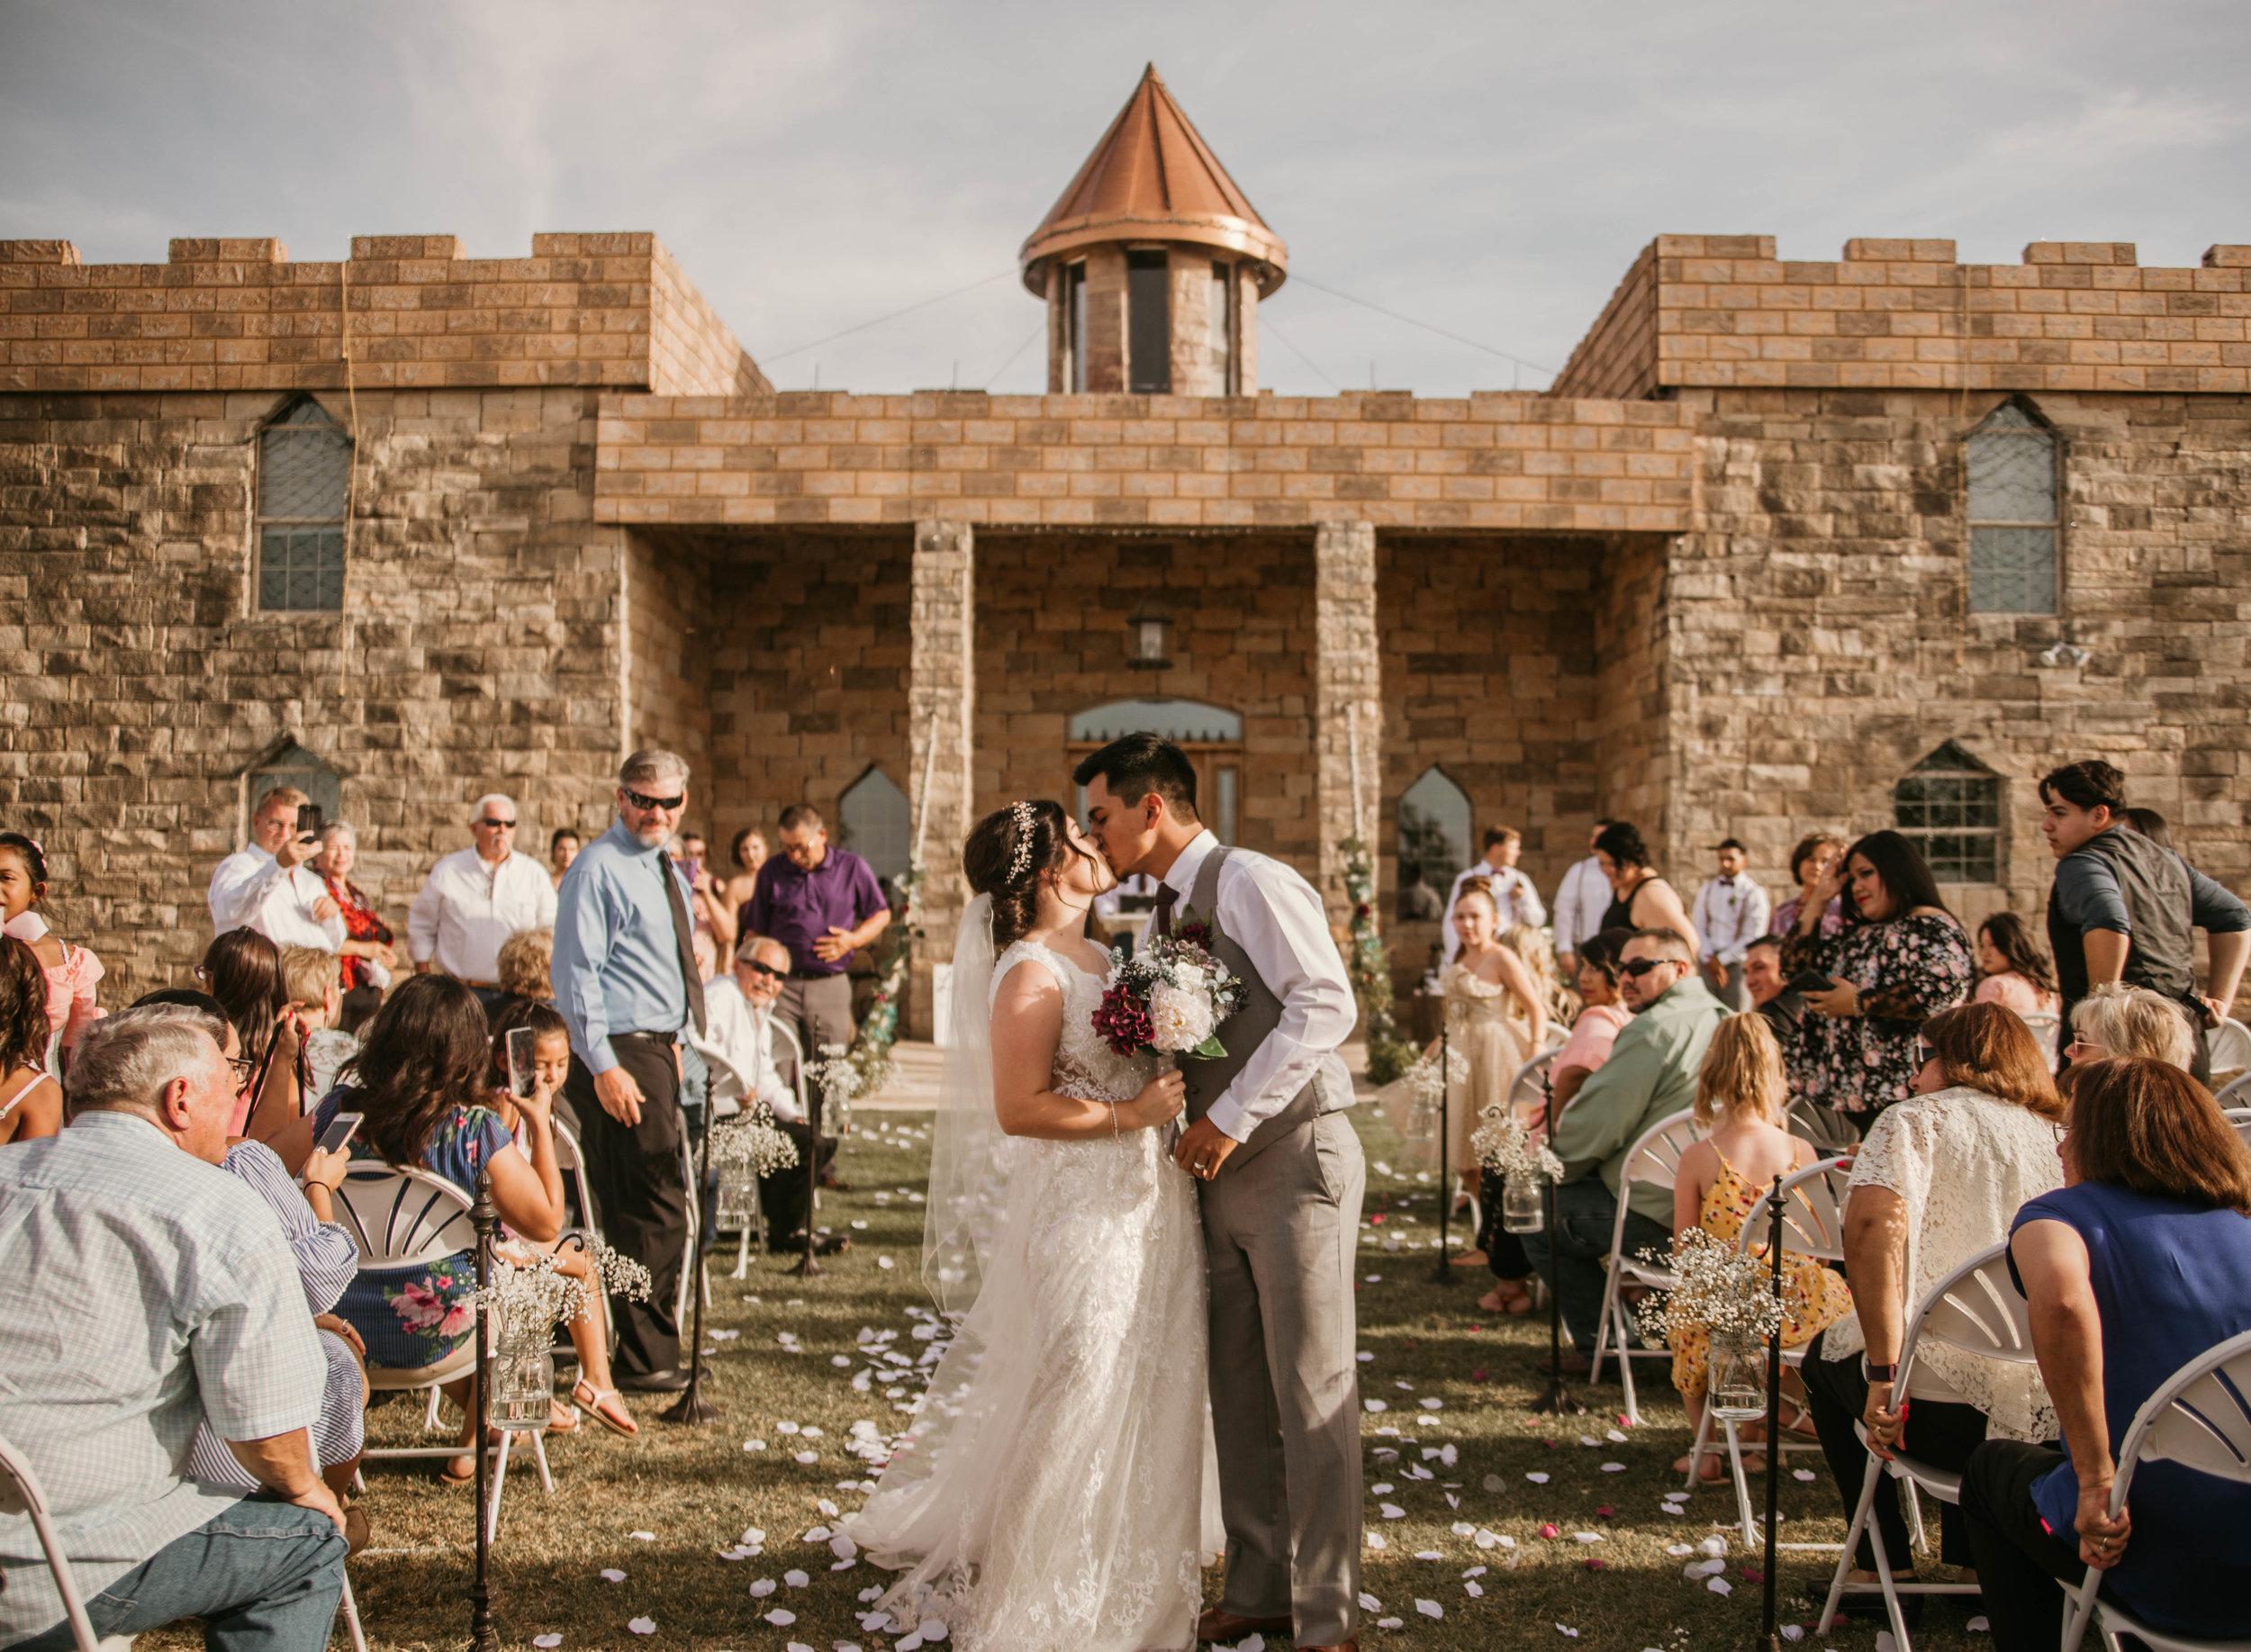 Lubbock,Texas WeddingDM7A1177.jpg